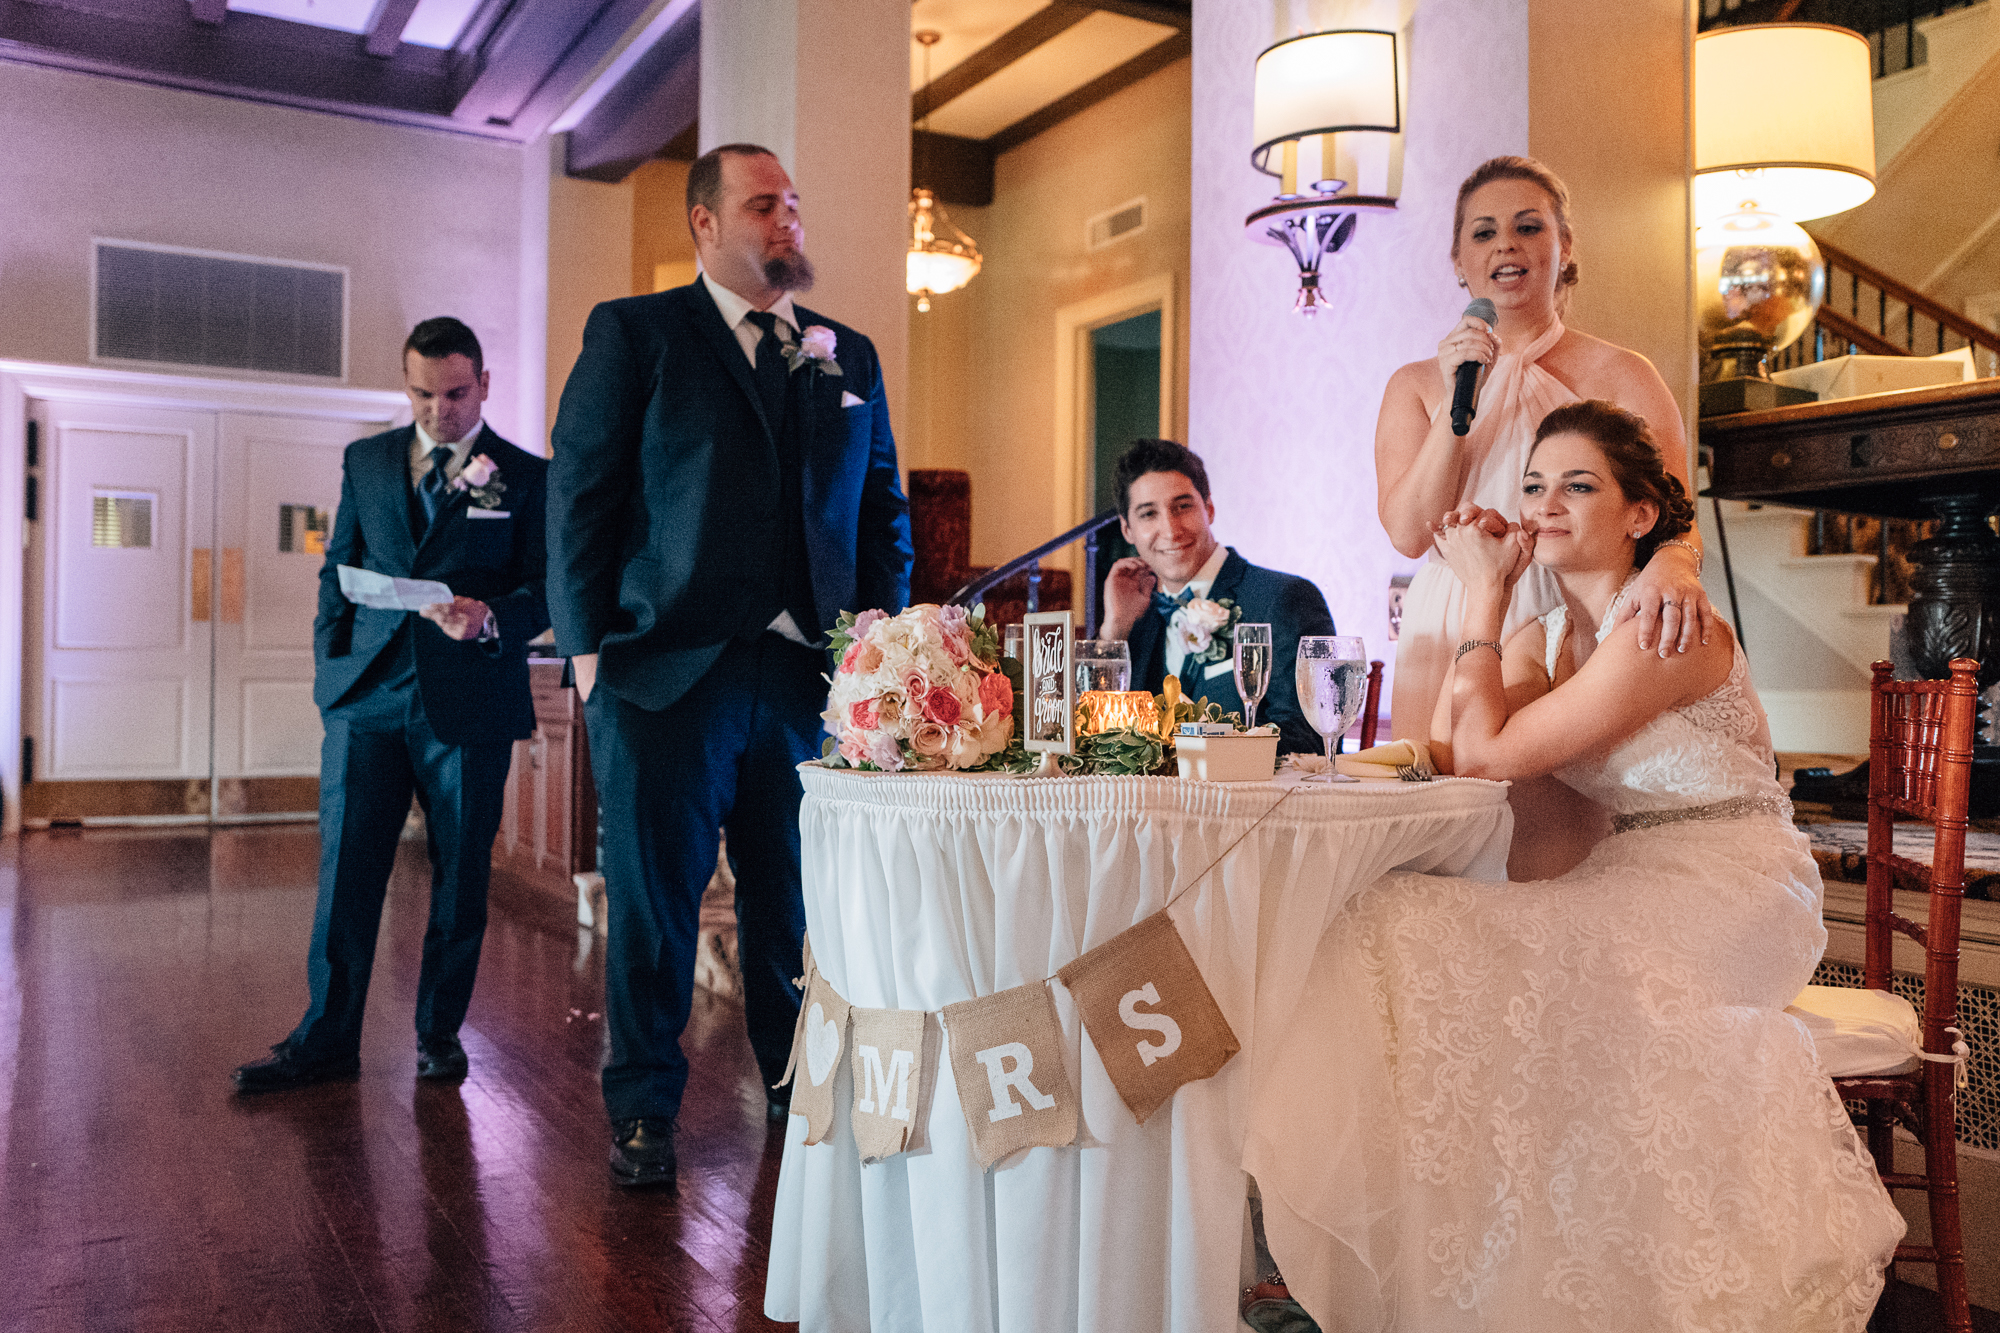 scranton-wedding-photography-zak-zavada-2016.06-rebeccaIan-0760.jpg